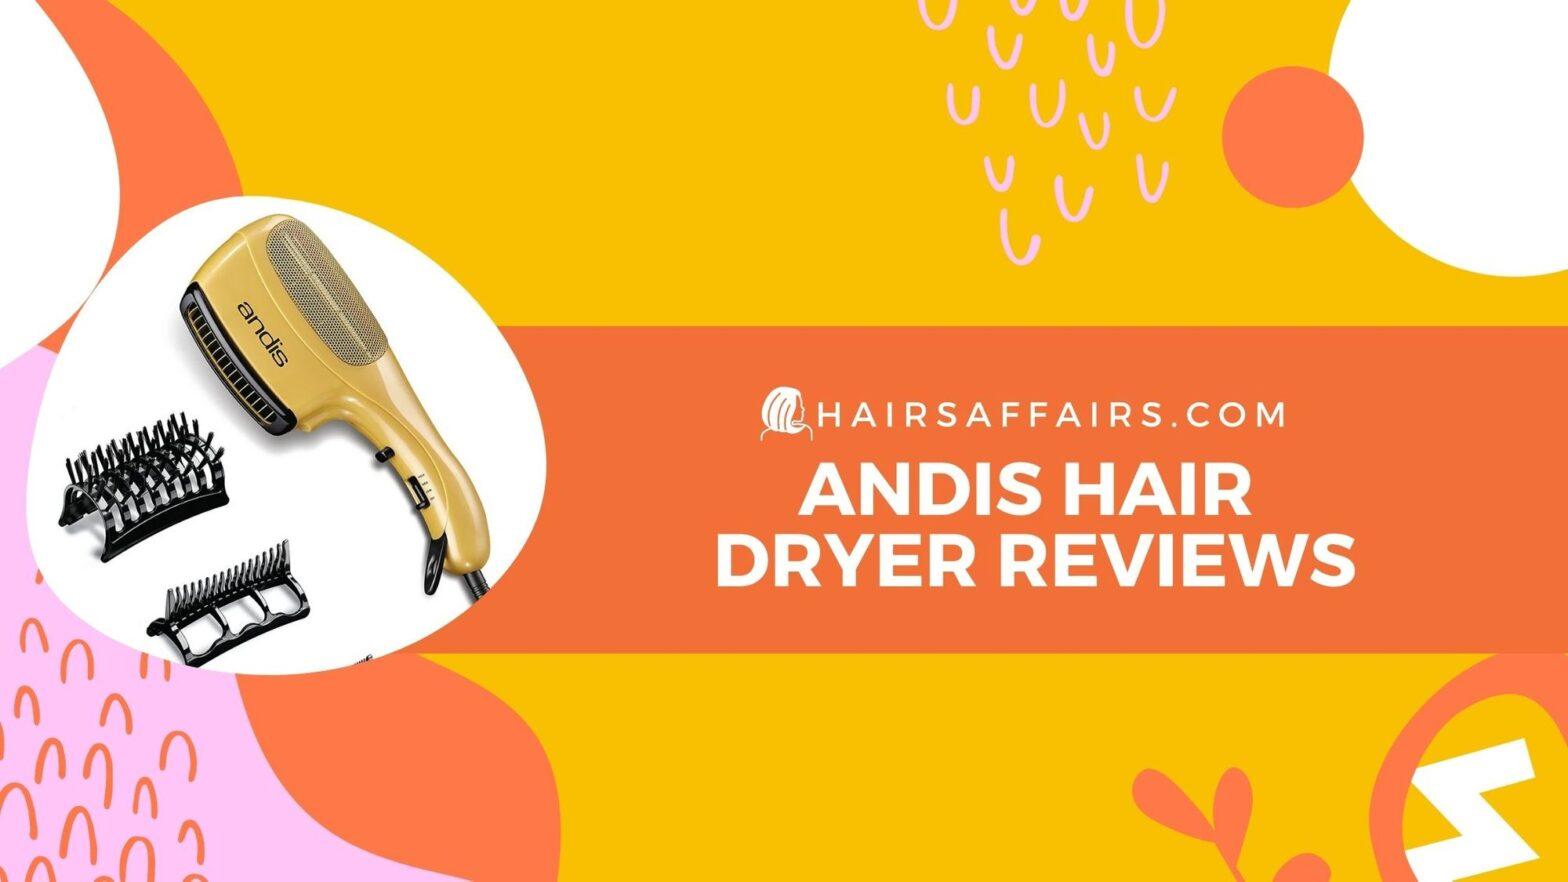 HA-Andis-hair-dryer-Reviews